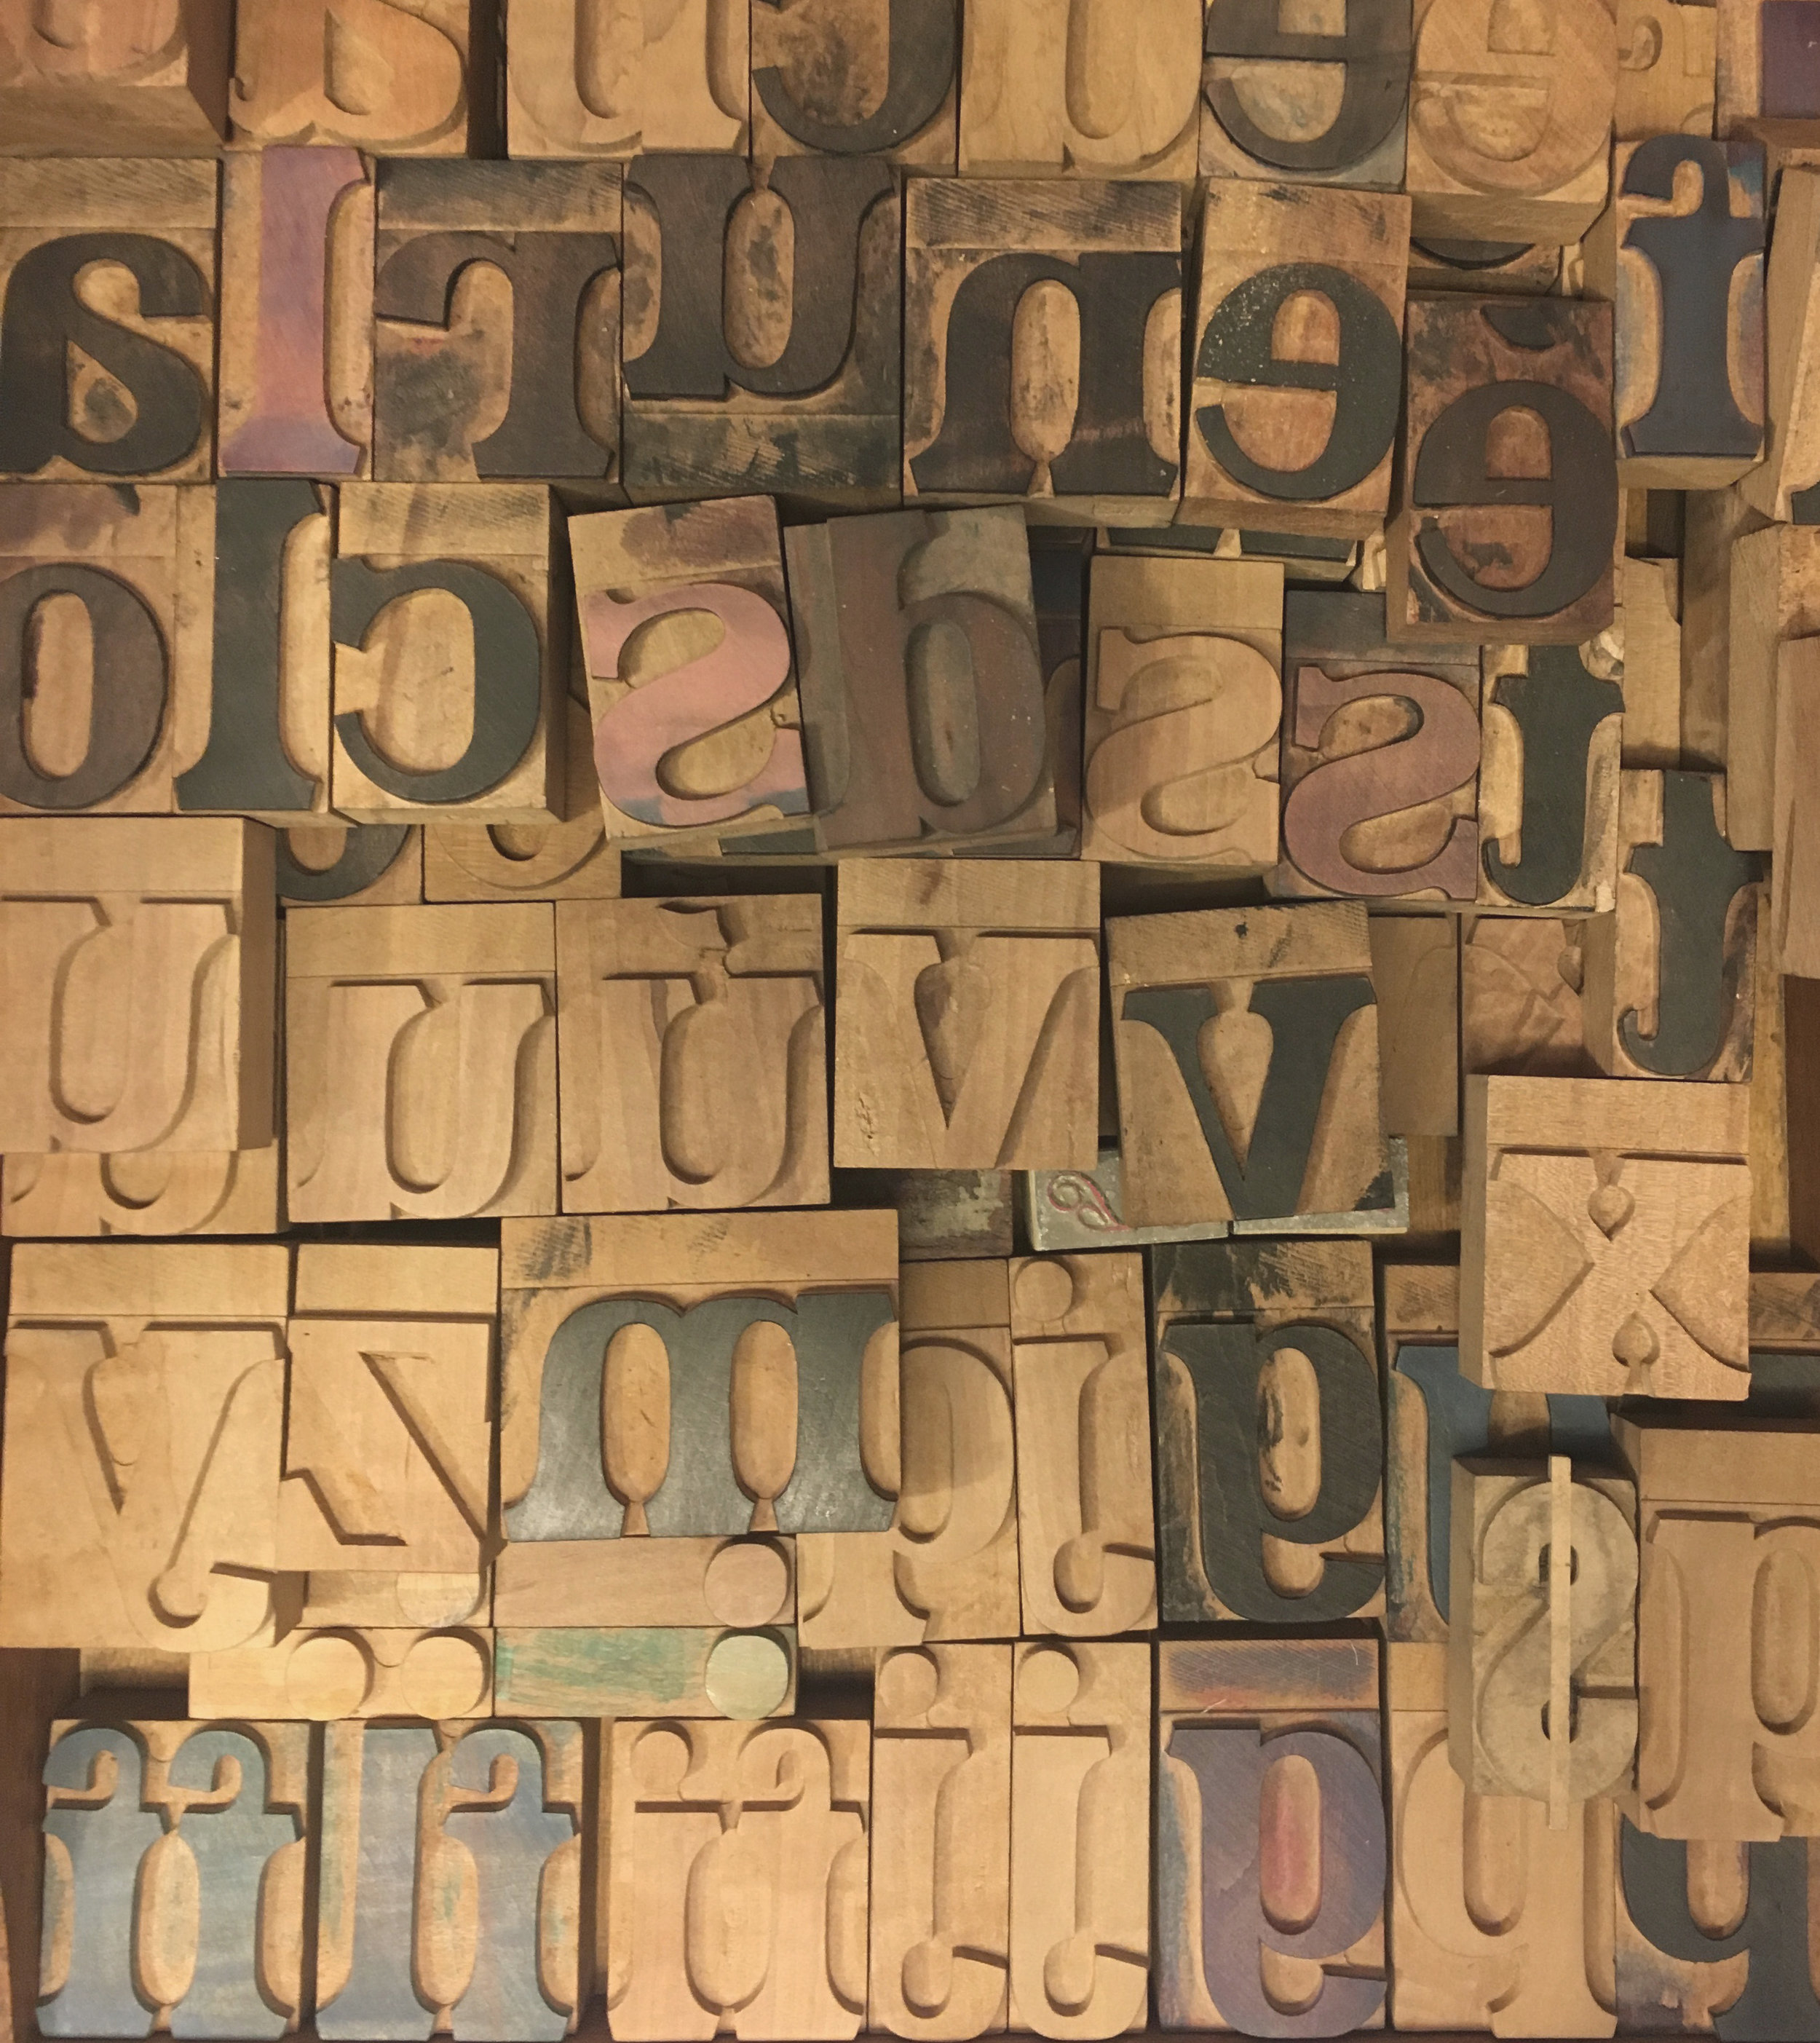 4-personalpress-taller-papel-principal-letterpress-imprenta-tipografica-1.jpg